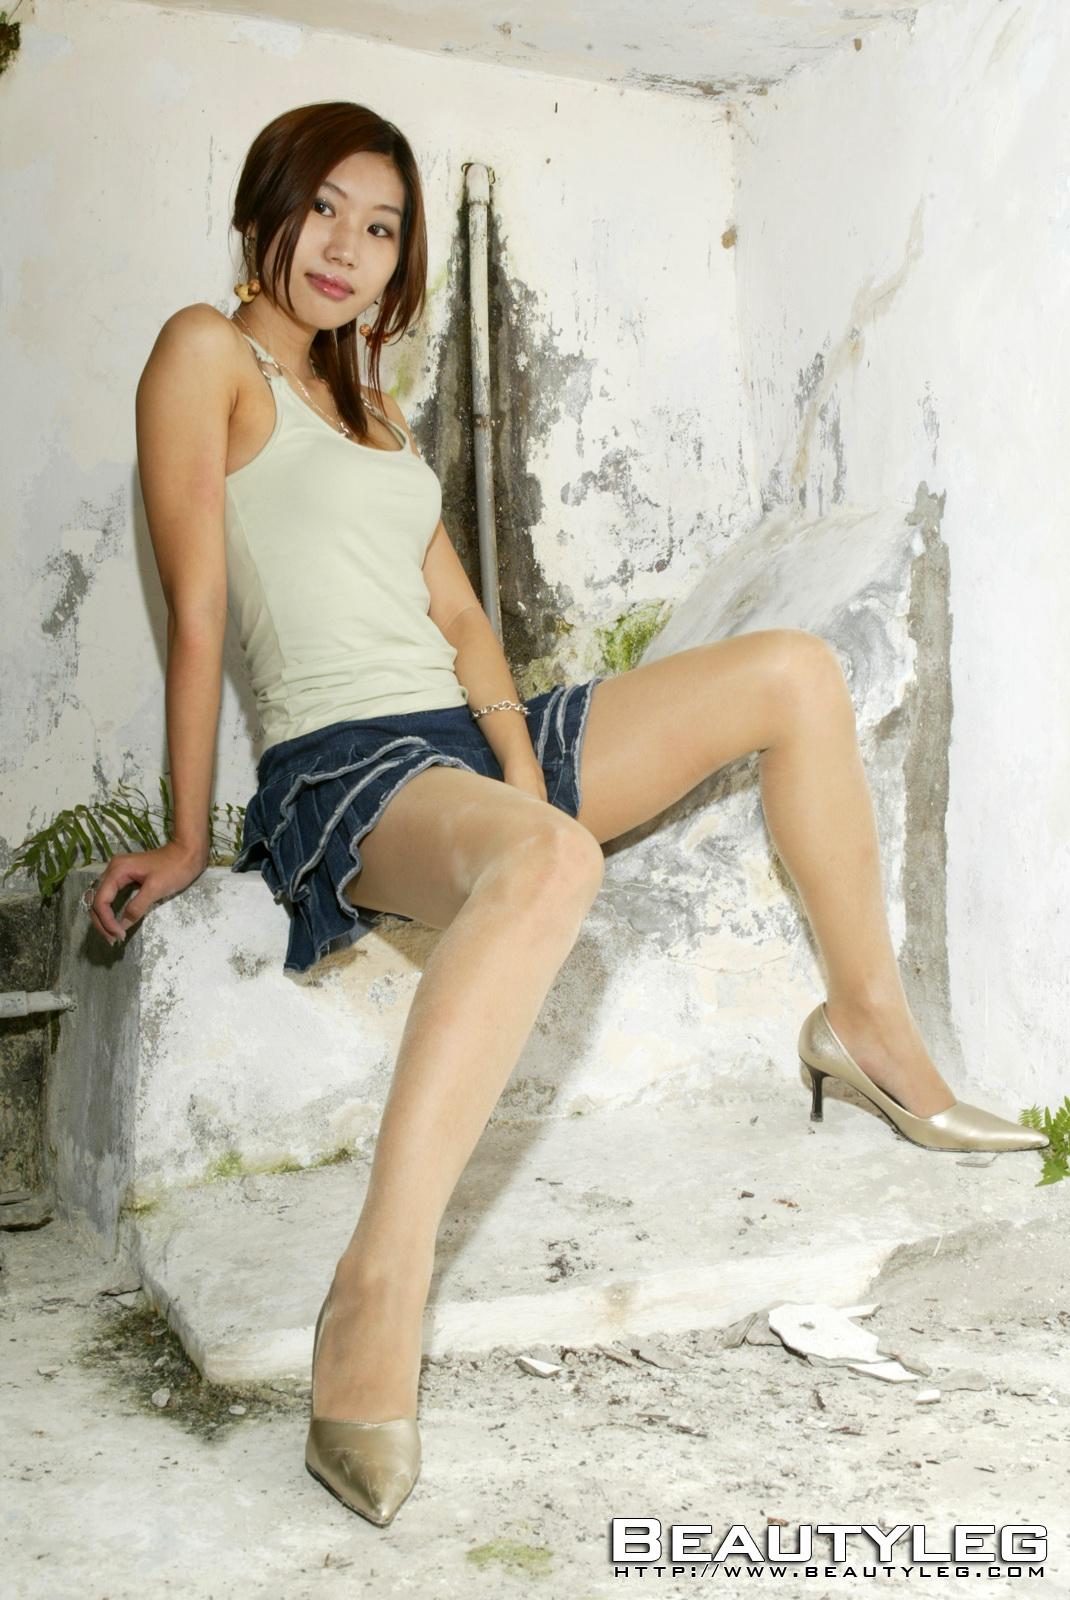 http://4.bp.blogspot.com/-UmWtt7thNKk/TsCVgpqjNlI/AAAAAAAACxk/ZIk1Uydxbpo/s1600/shiny+tights+sexy+n+%25287%2529.jpg